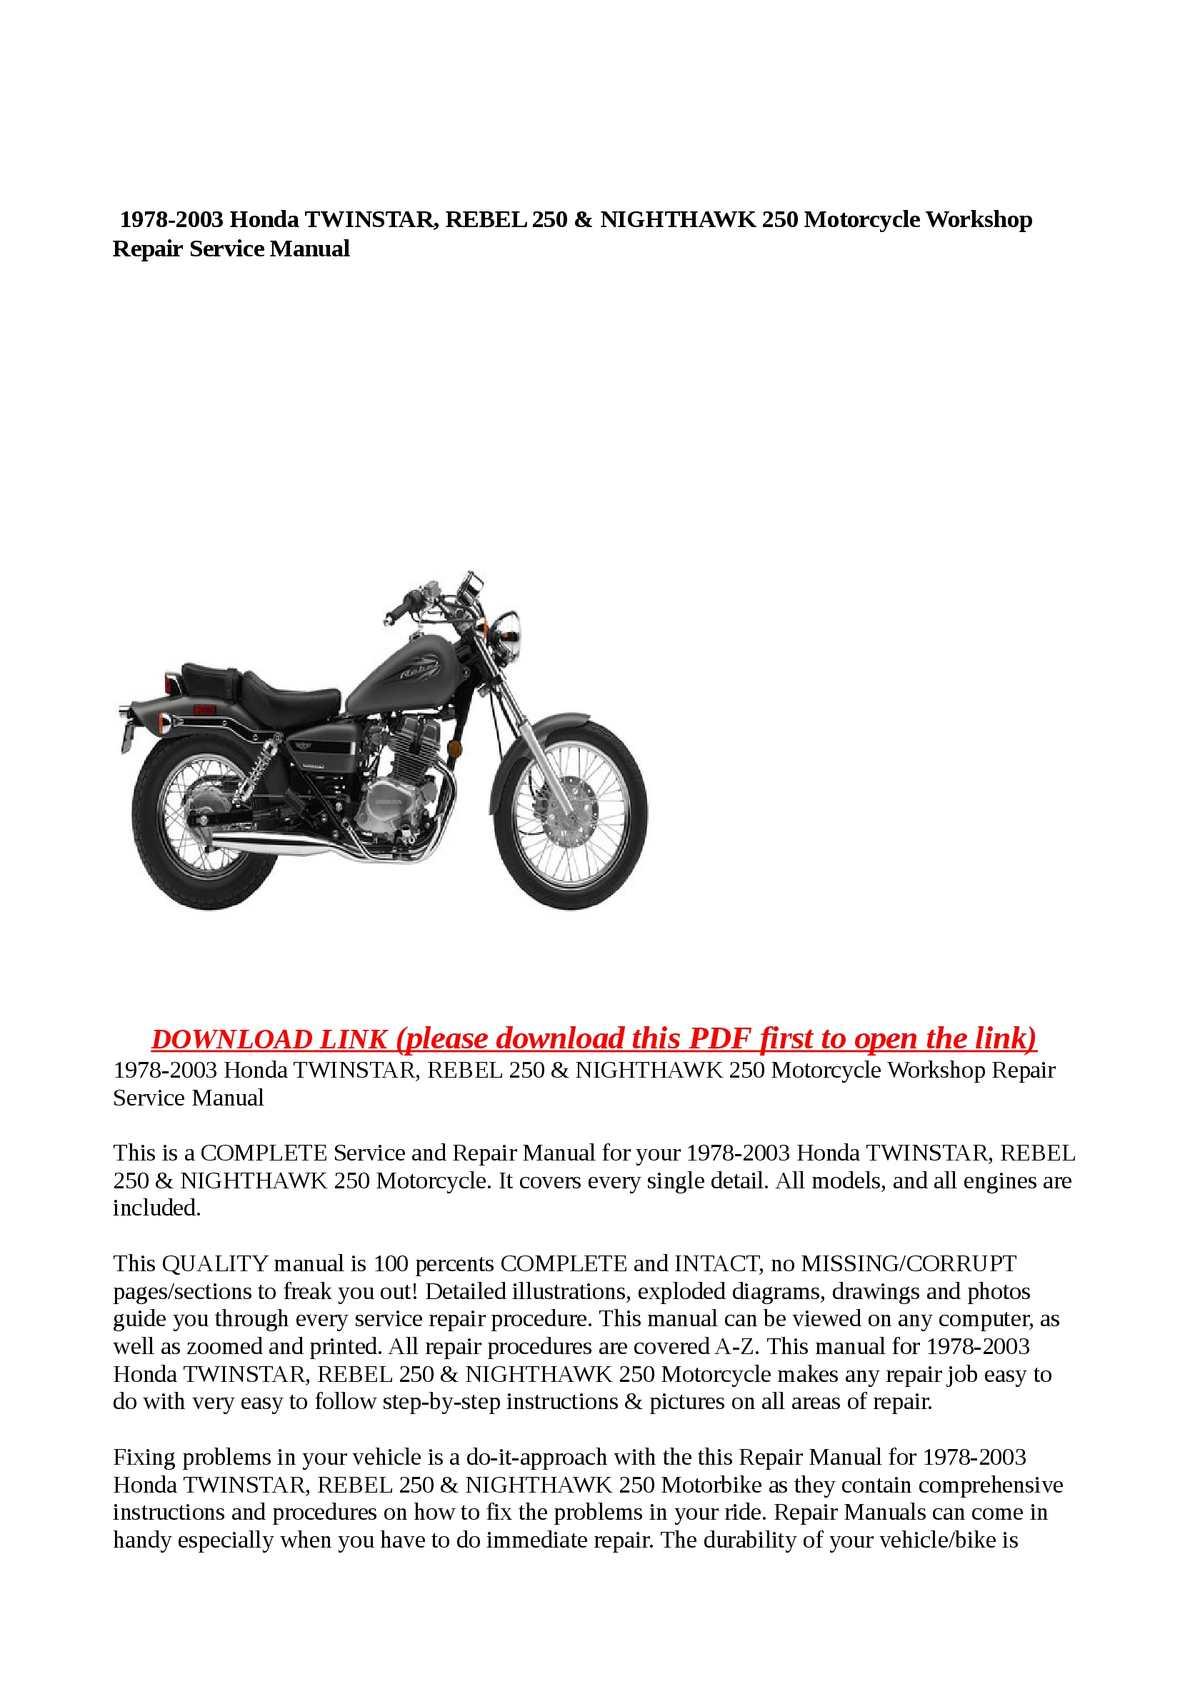 Calaméo - 1978-2003 Honda TWINSTAR, REBEL 250 & NIGHTHAWK 250 Motorcycle  Workshop Repair Service Manual